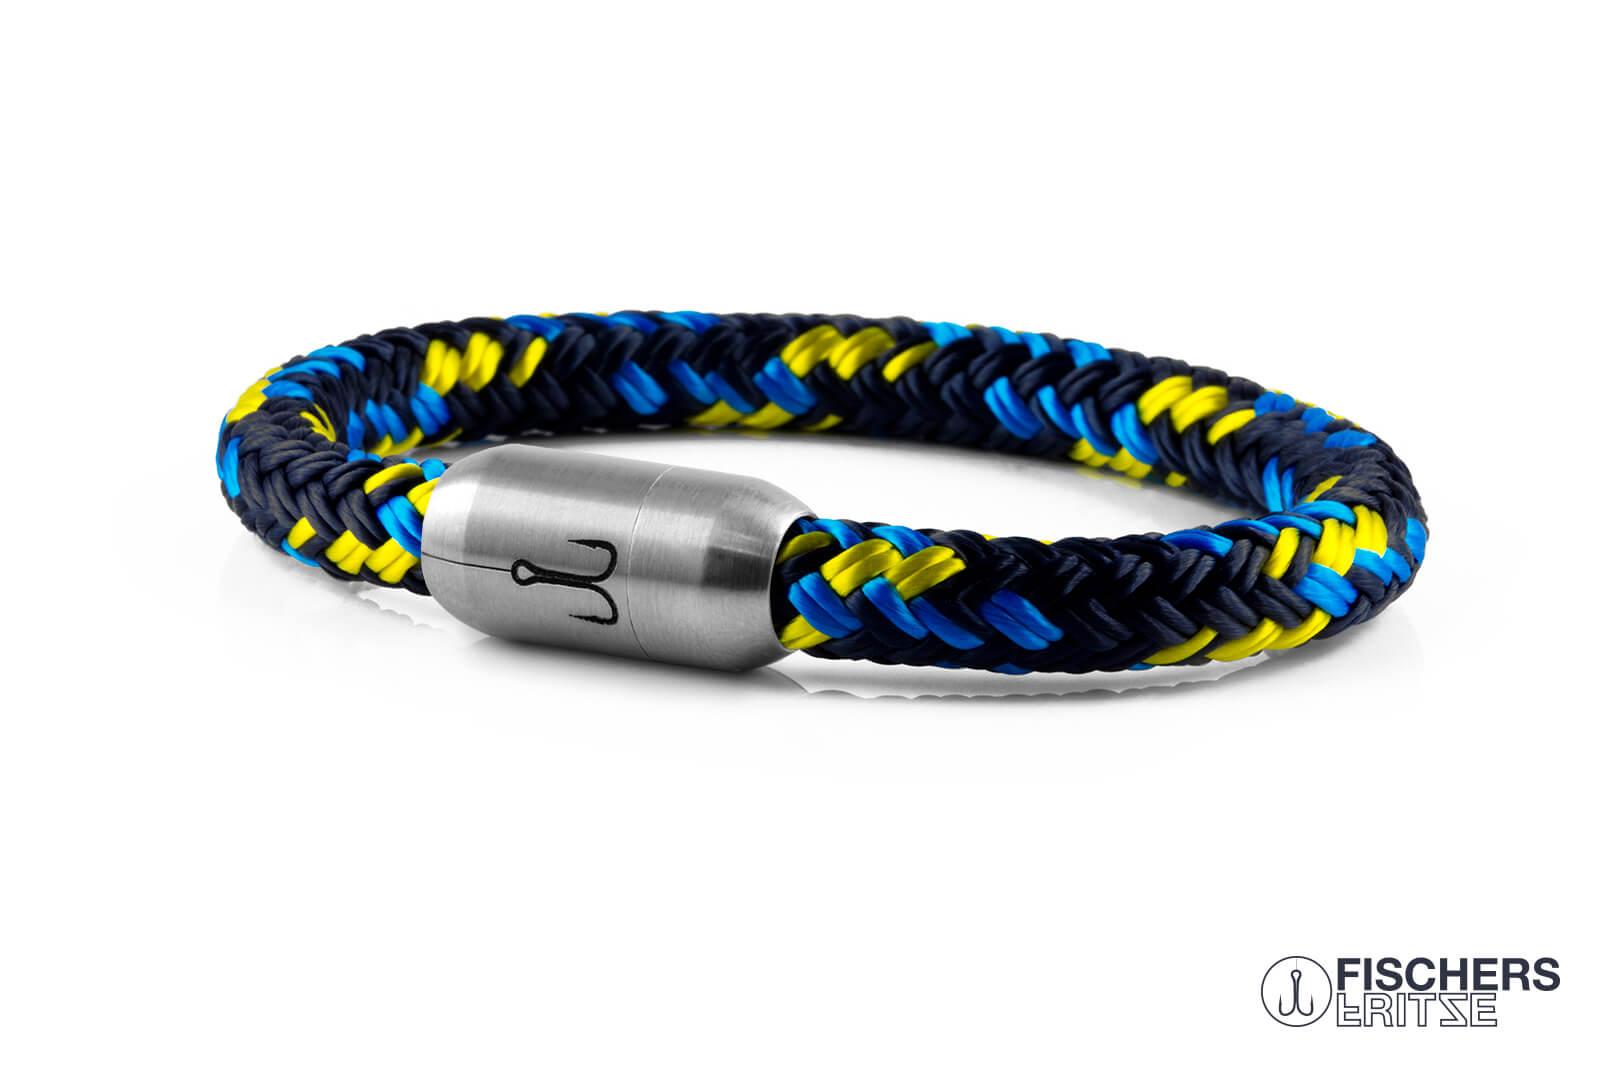 armband-fischers-fritze-makrele-marineblau-stahlblau-gelb-segeltau